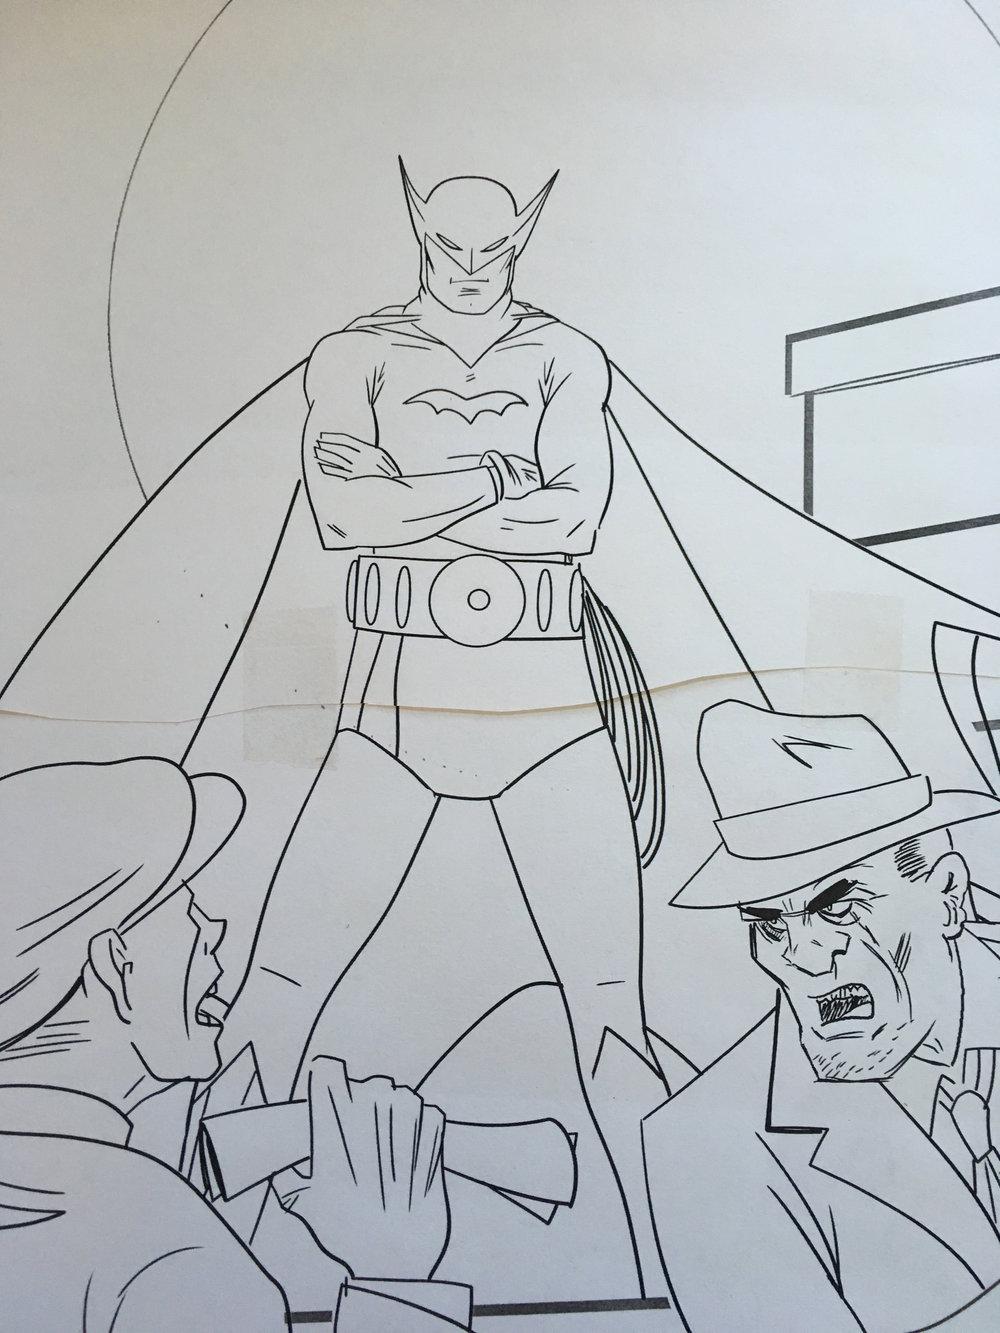 BAT Second sketch.jpg